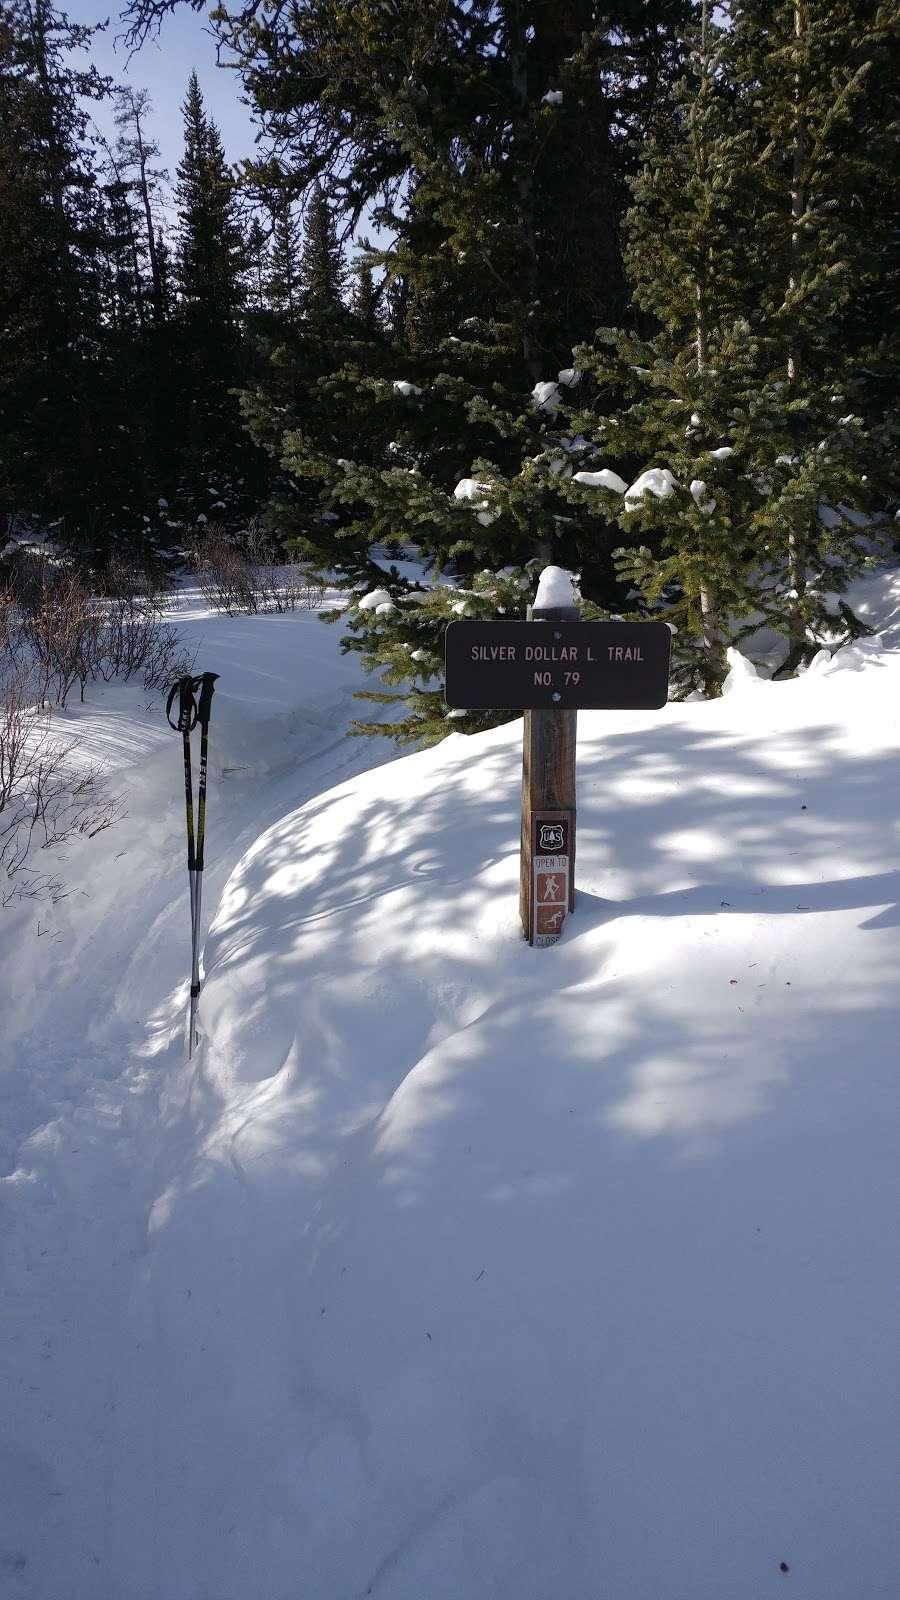 Silver Dollar Lake Trailhead - park    Photo 6 of 10   Address: Dillon, CO 80435, USA